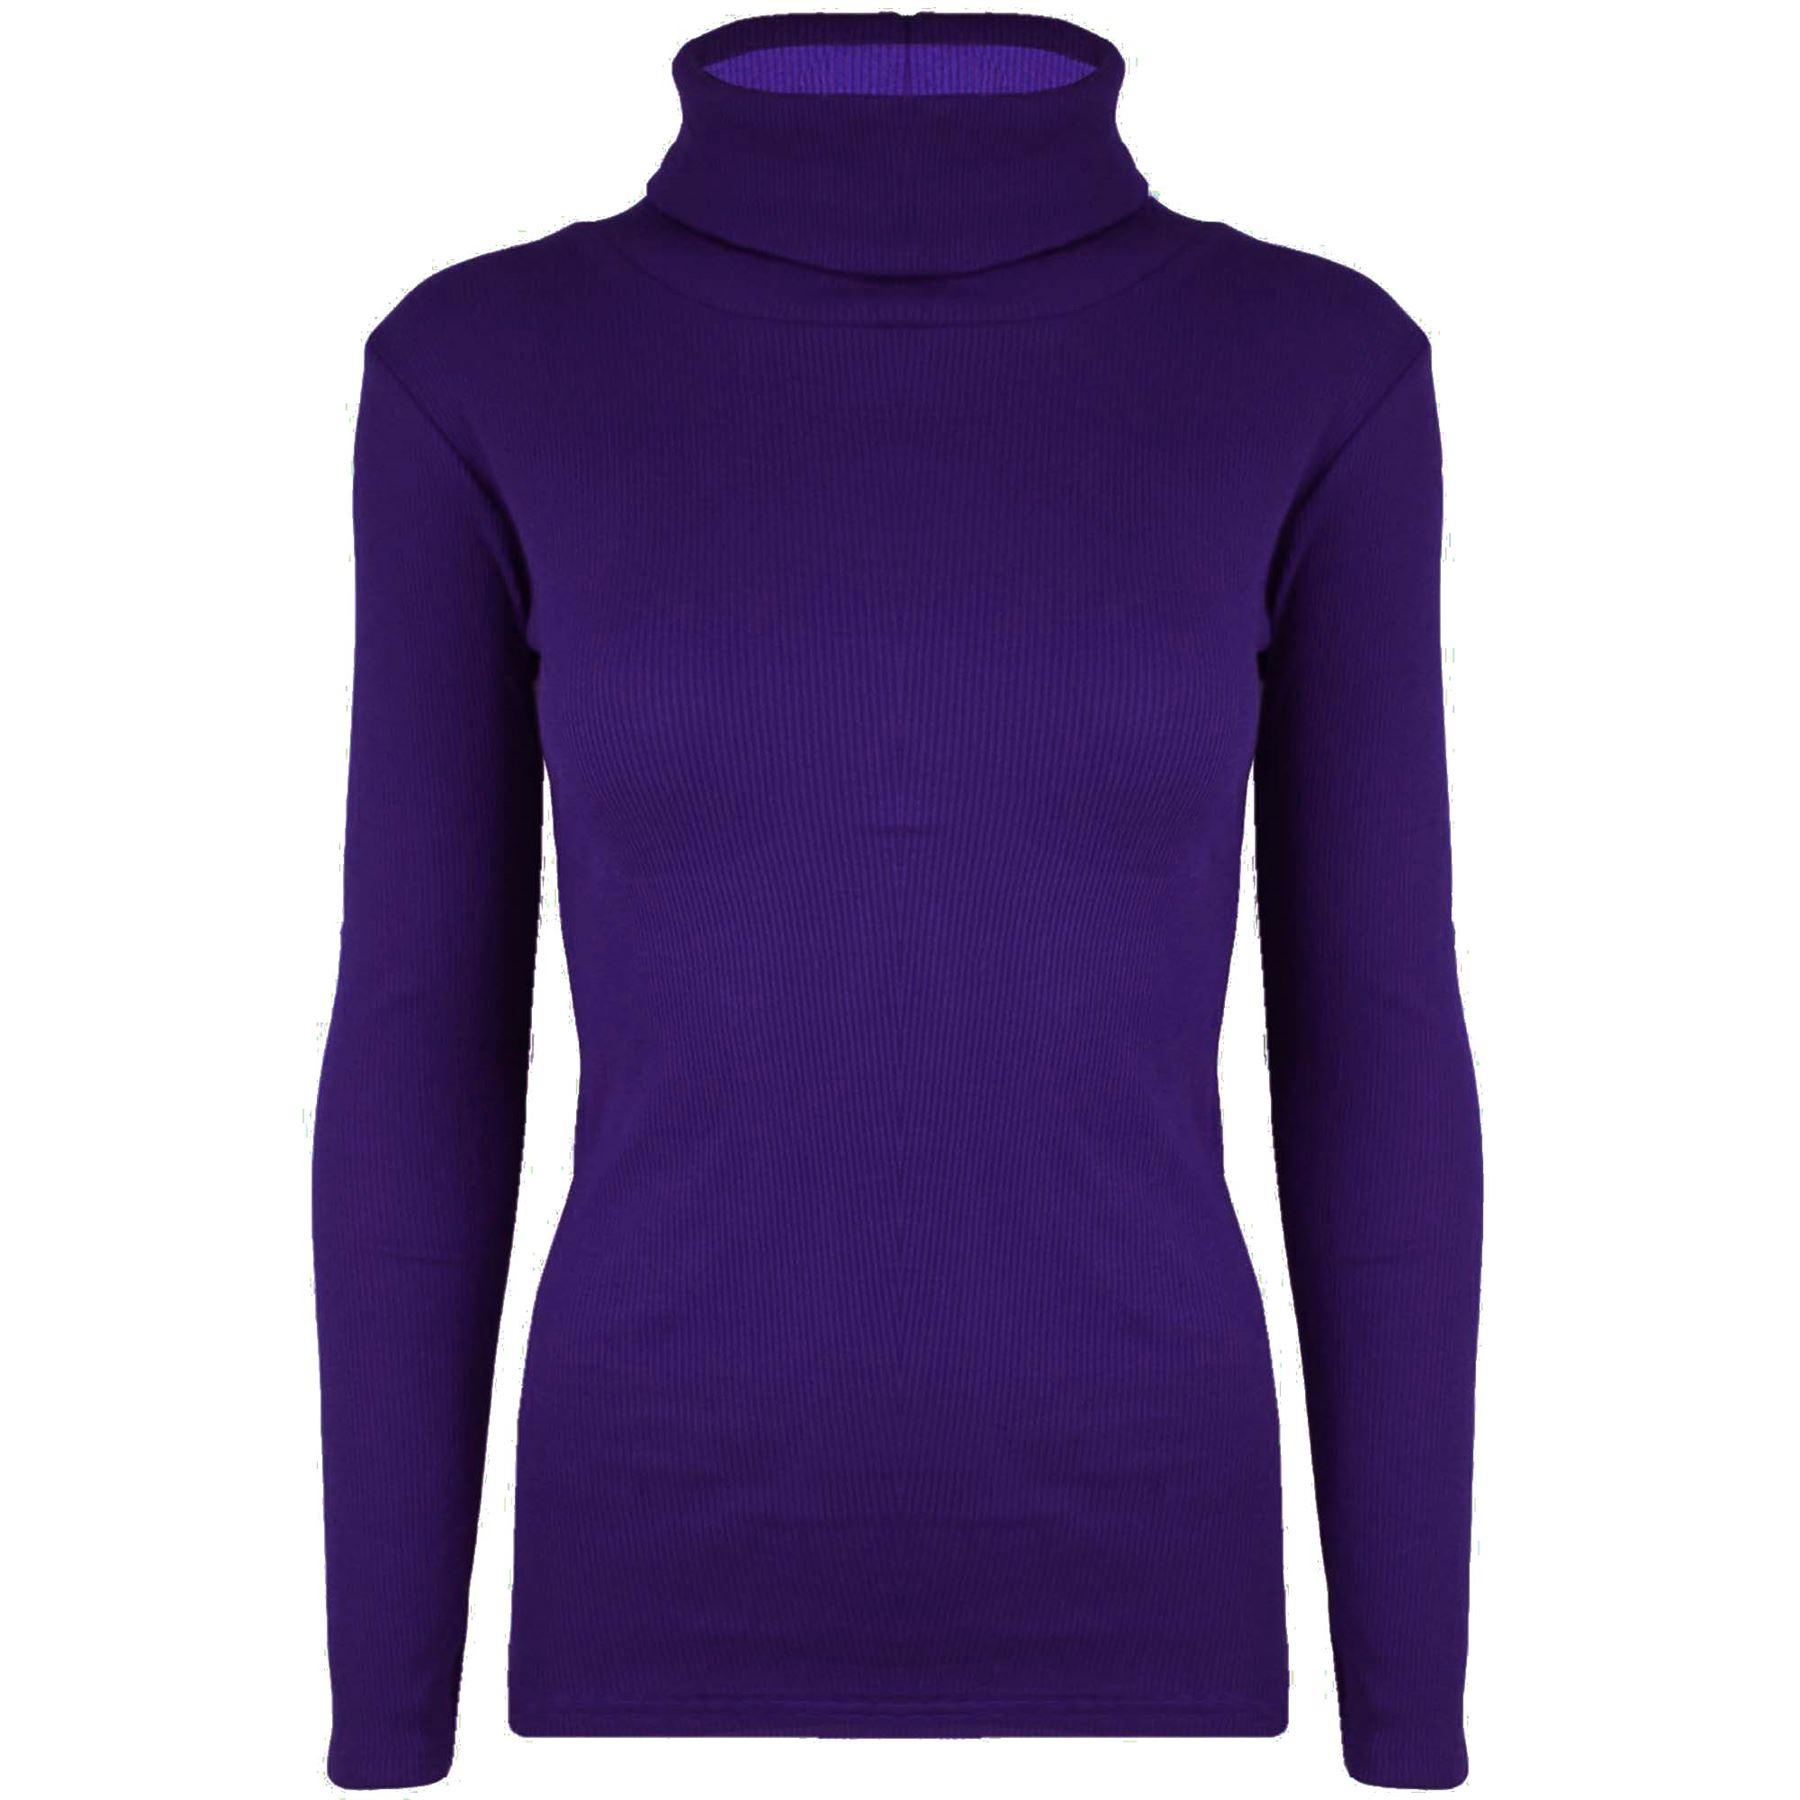 neu damen dehnbar rollkragen rollkragen gerippt lang rmlig t shirt top ebay. Black Bedroom Furniture Sets. Home Design Ideas